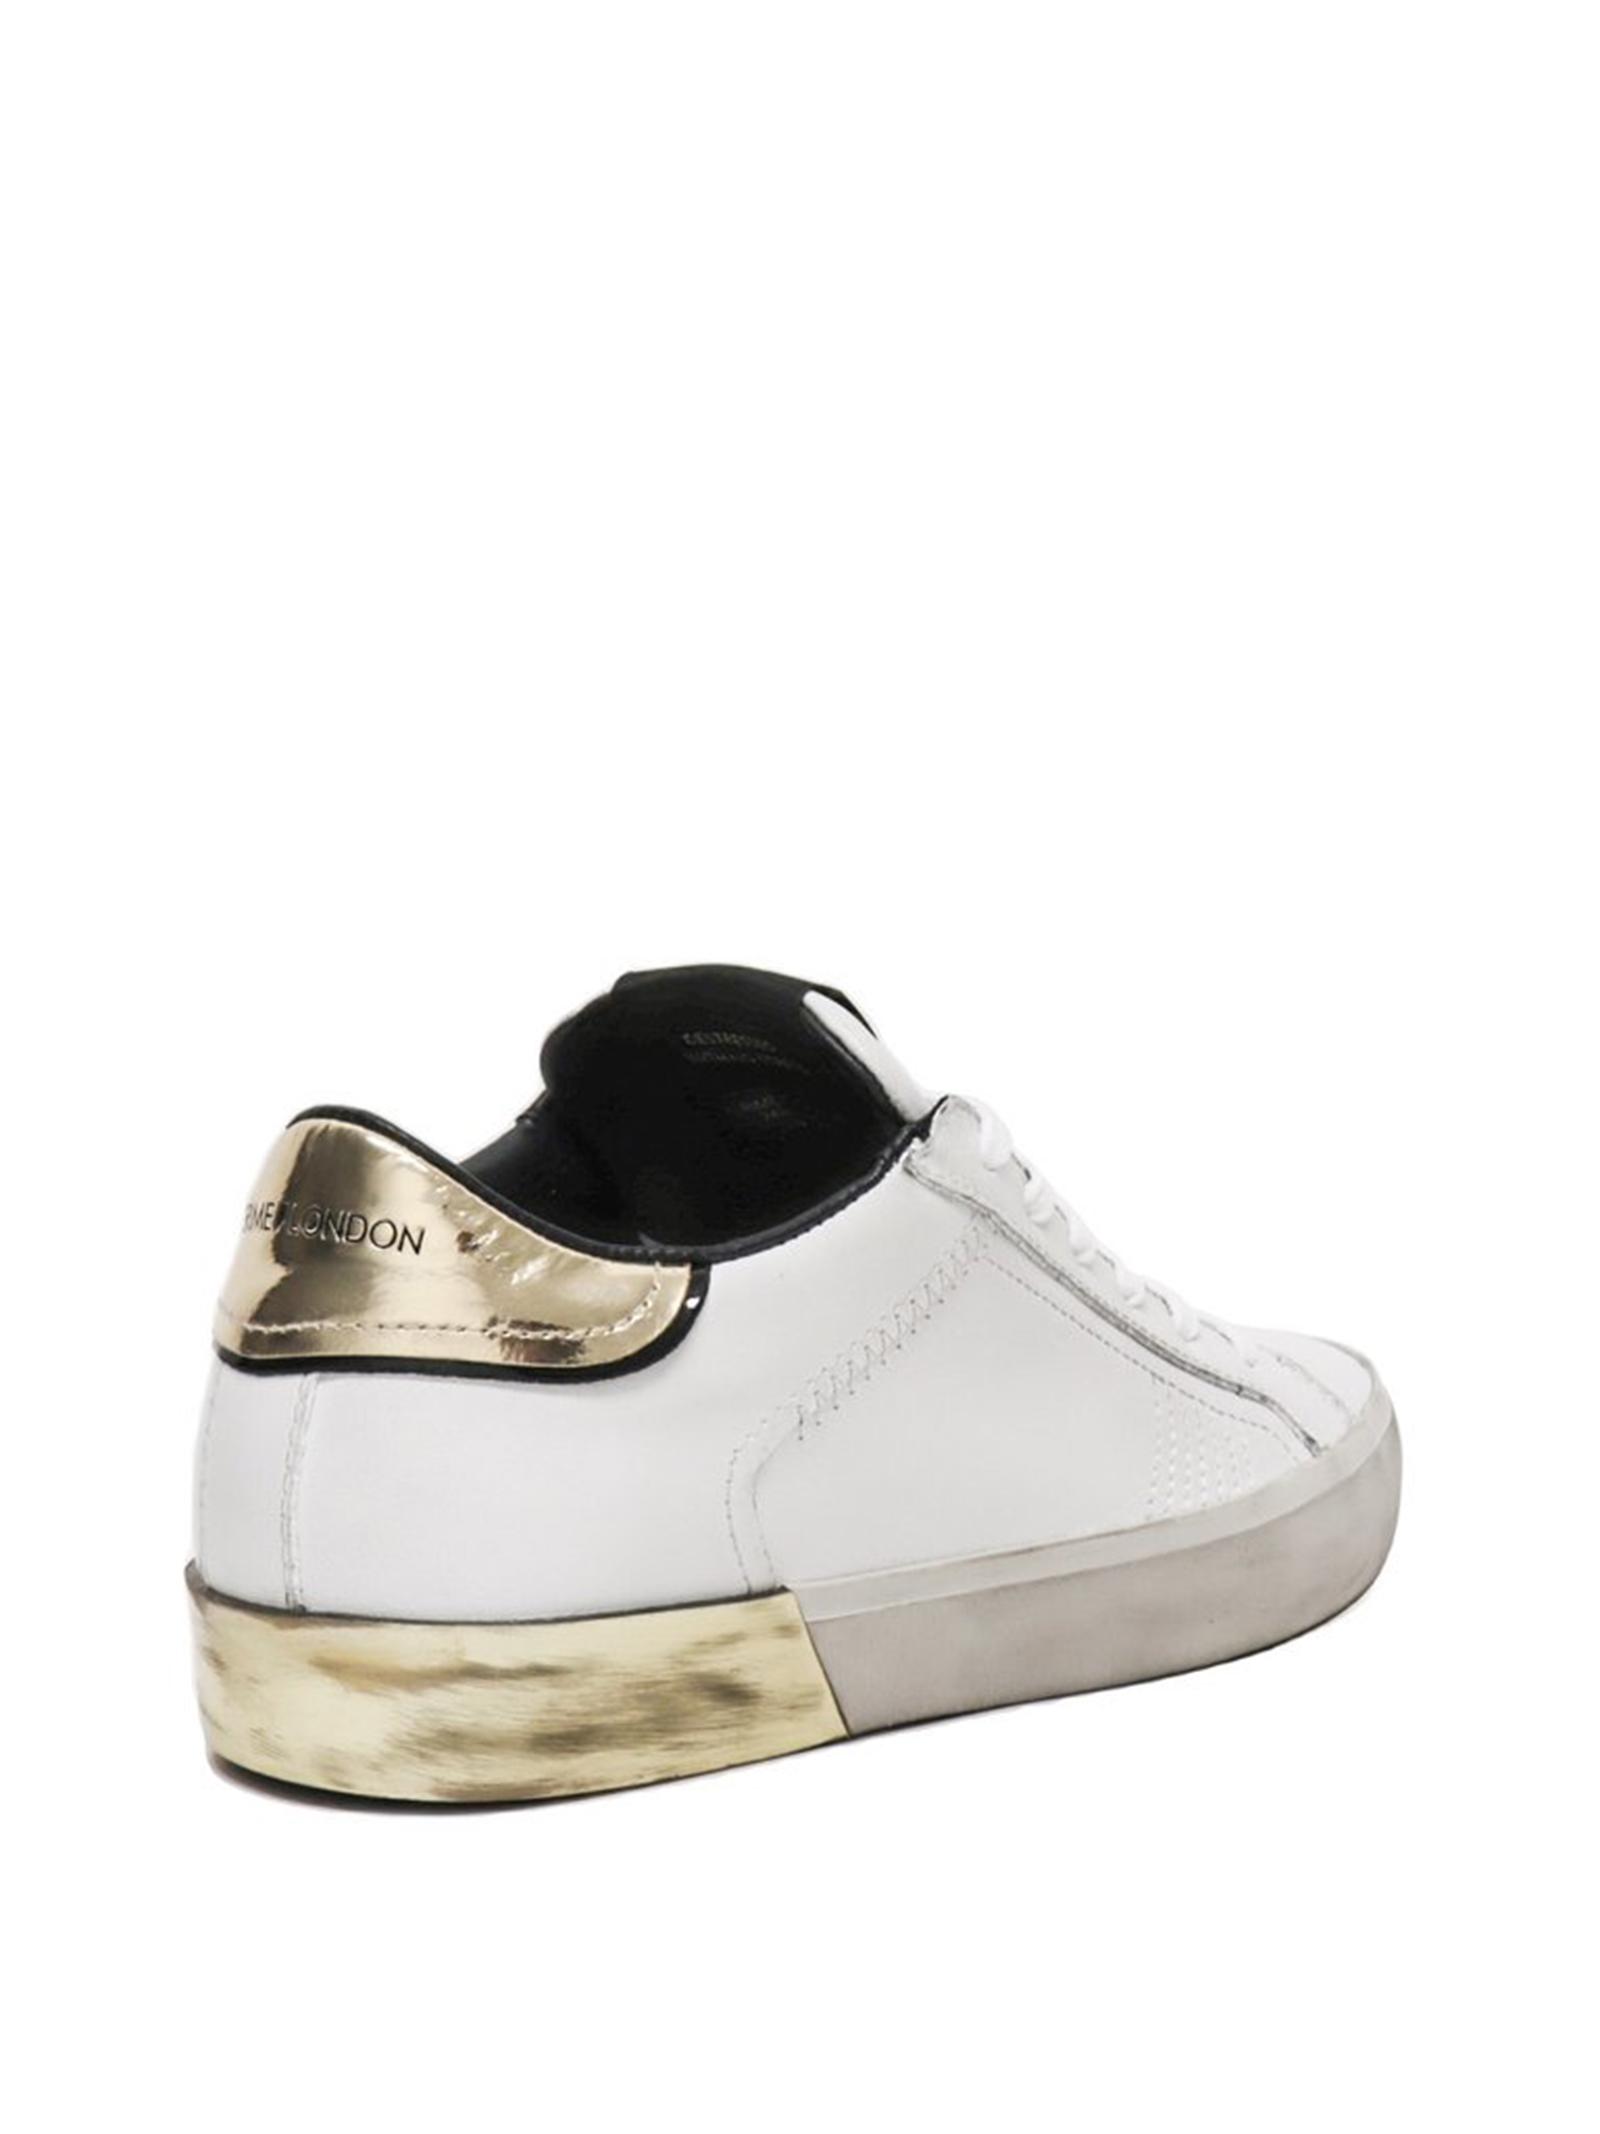 Sneaker Low Top Distressed CRIME LONDON | Sneakers | 2436310